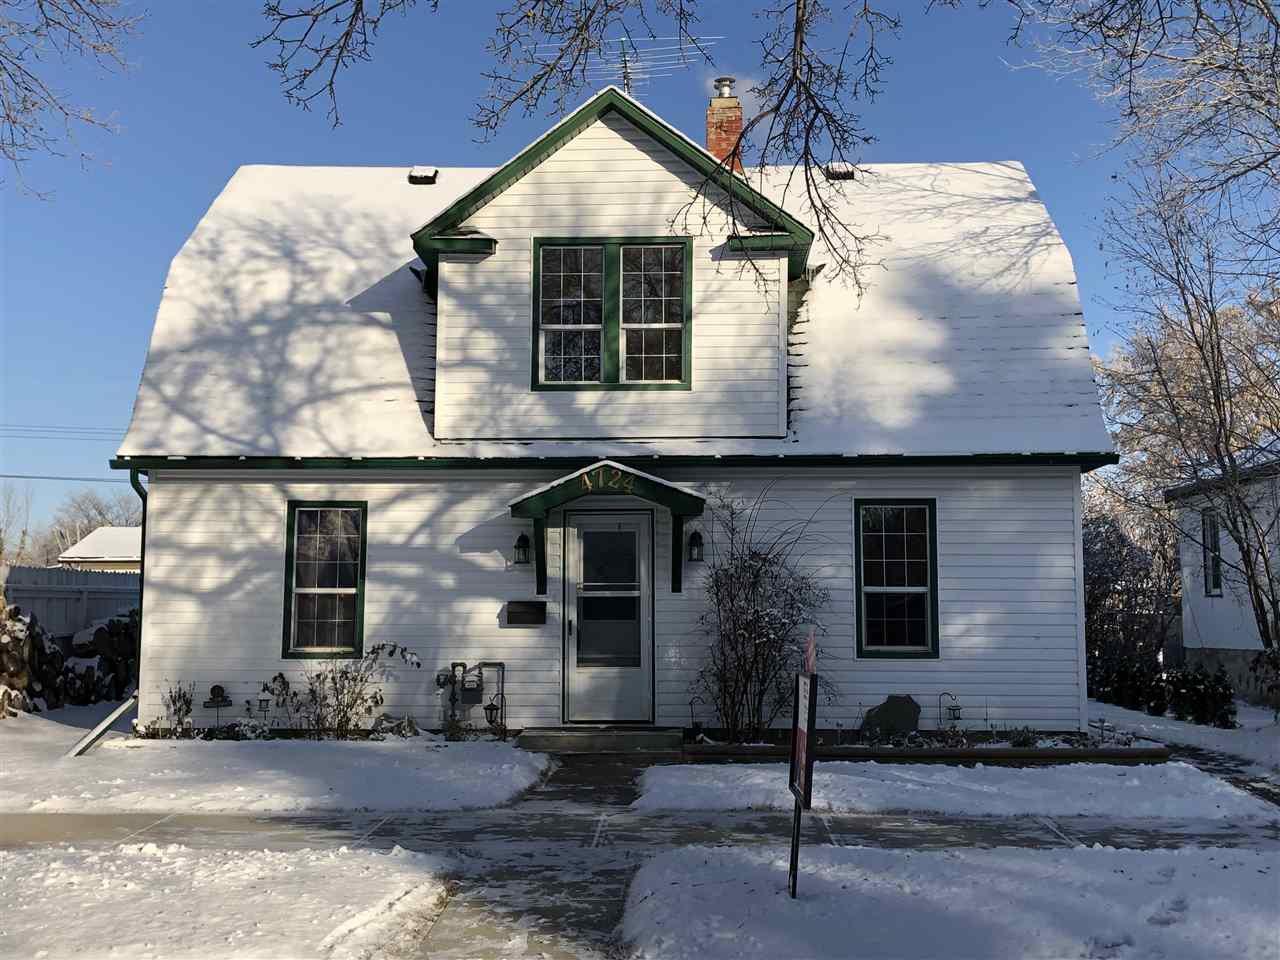 Main Photo: 4724 51 Avenue: Wetaskiwin House for sale : MLS®# E4175894